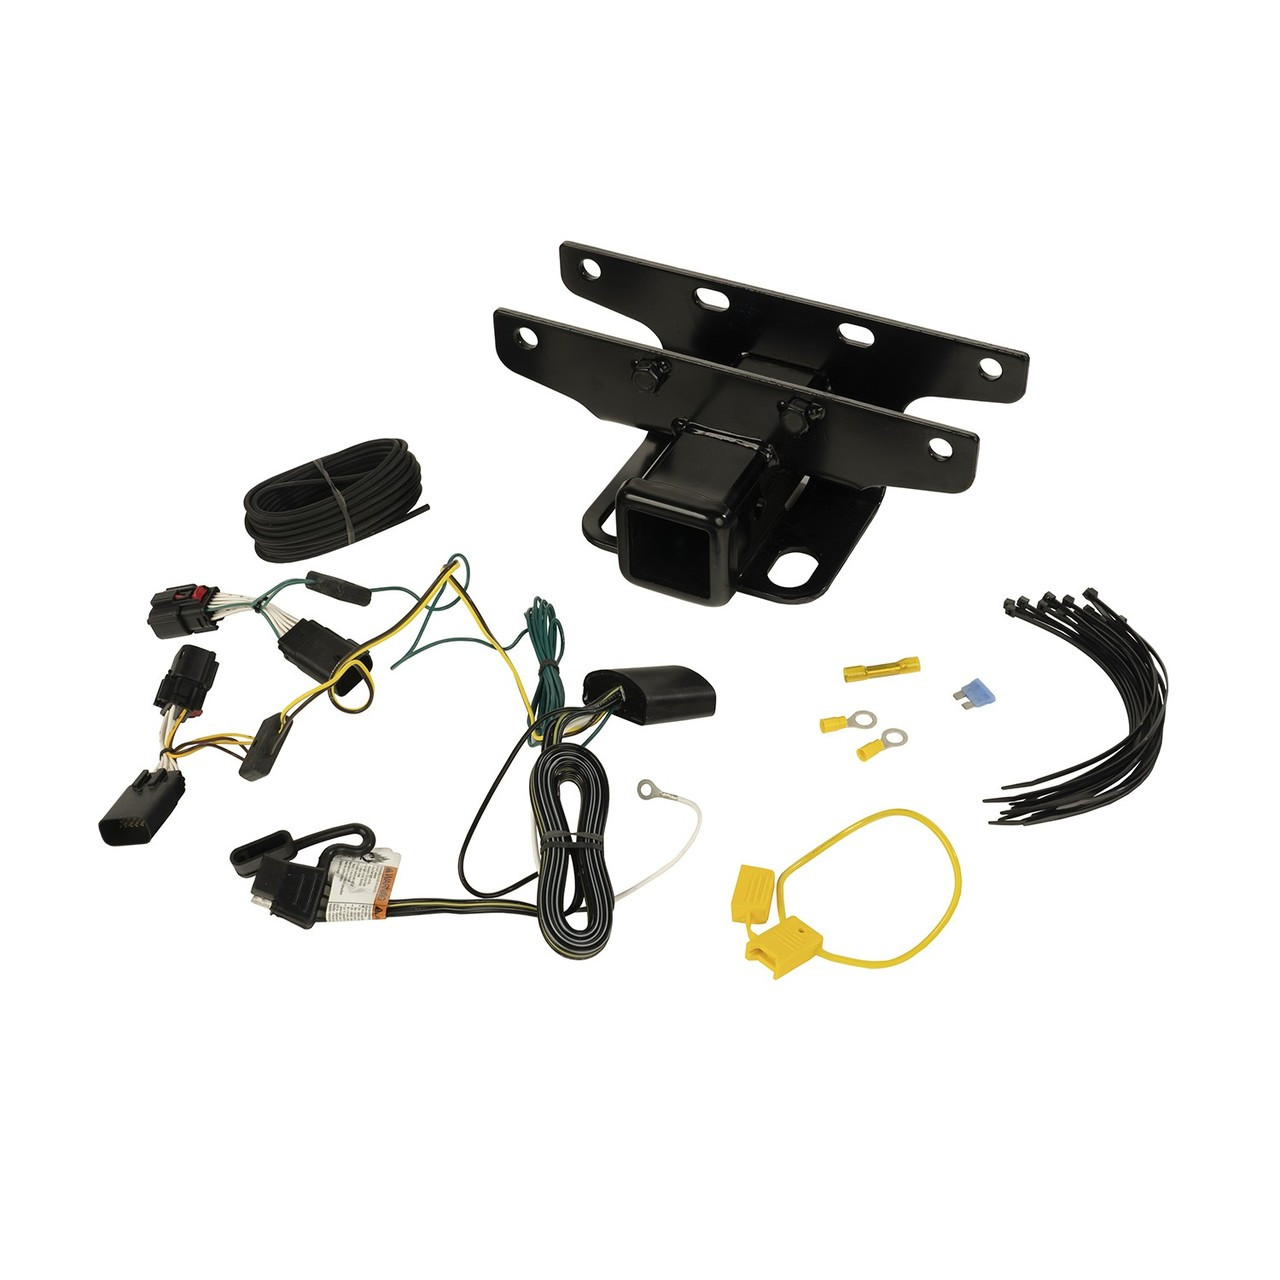 medium resolution of jeep wrangler jl receiver hitch kit w wiring harness 18 19 jl